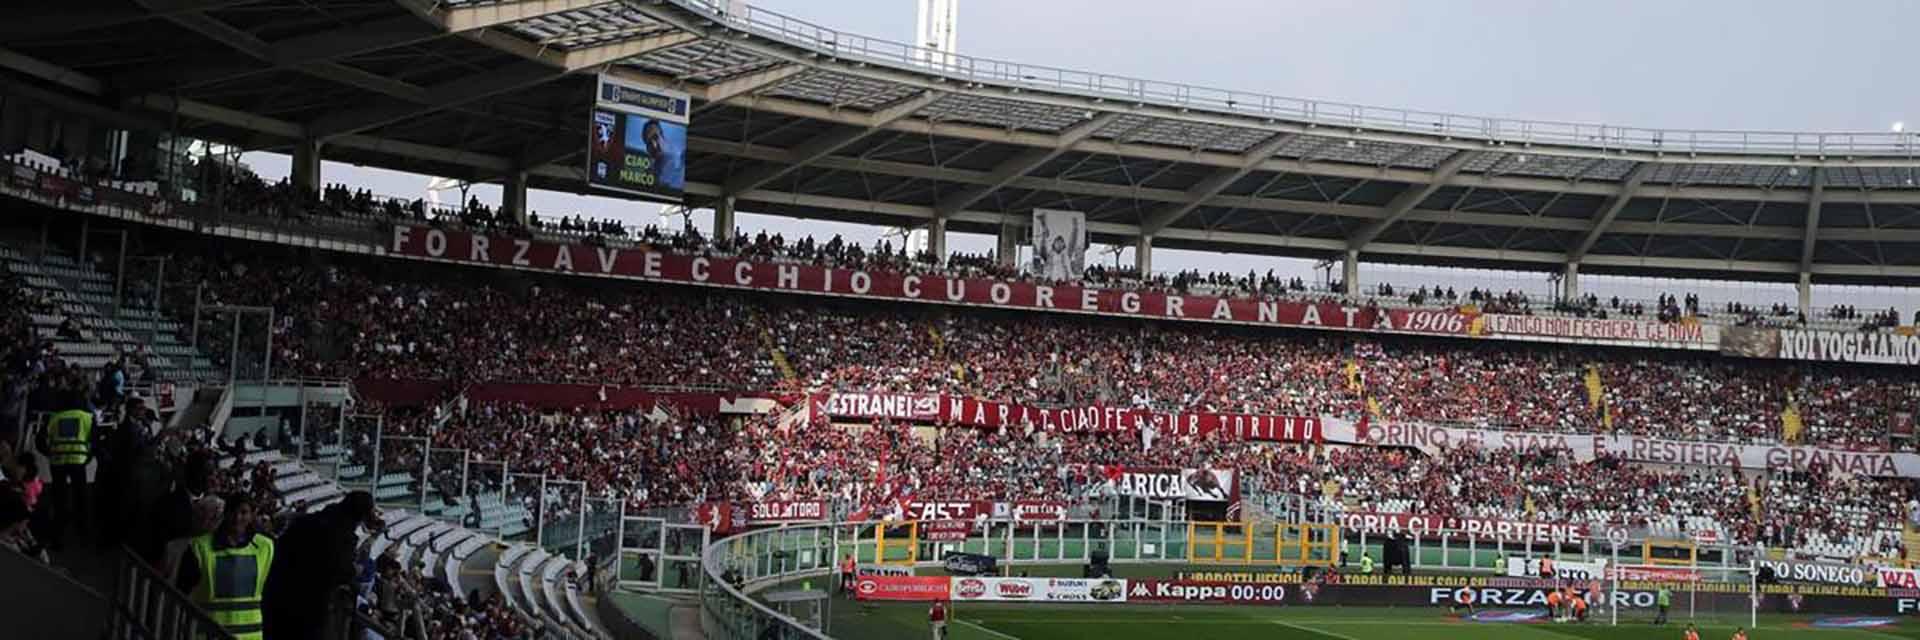 Torino FC - ACF Fiorentina, 0 decemberom 15:00